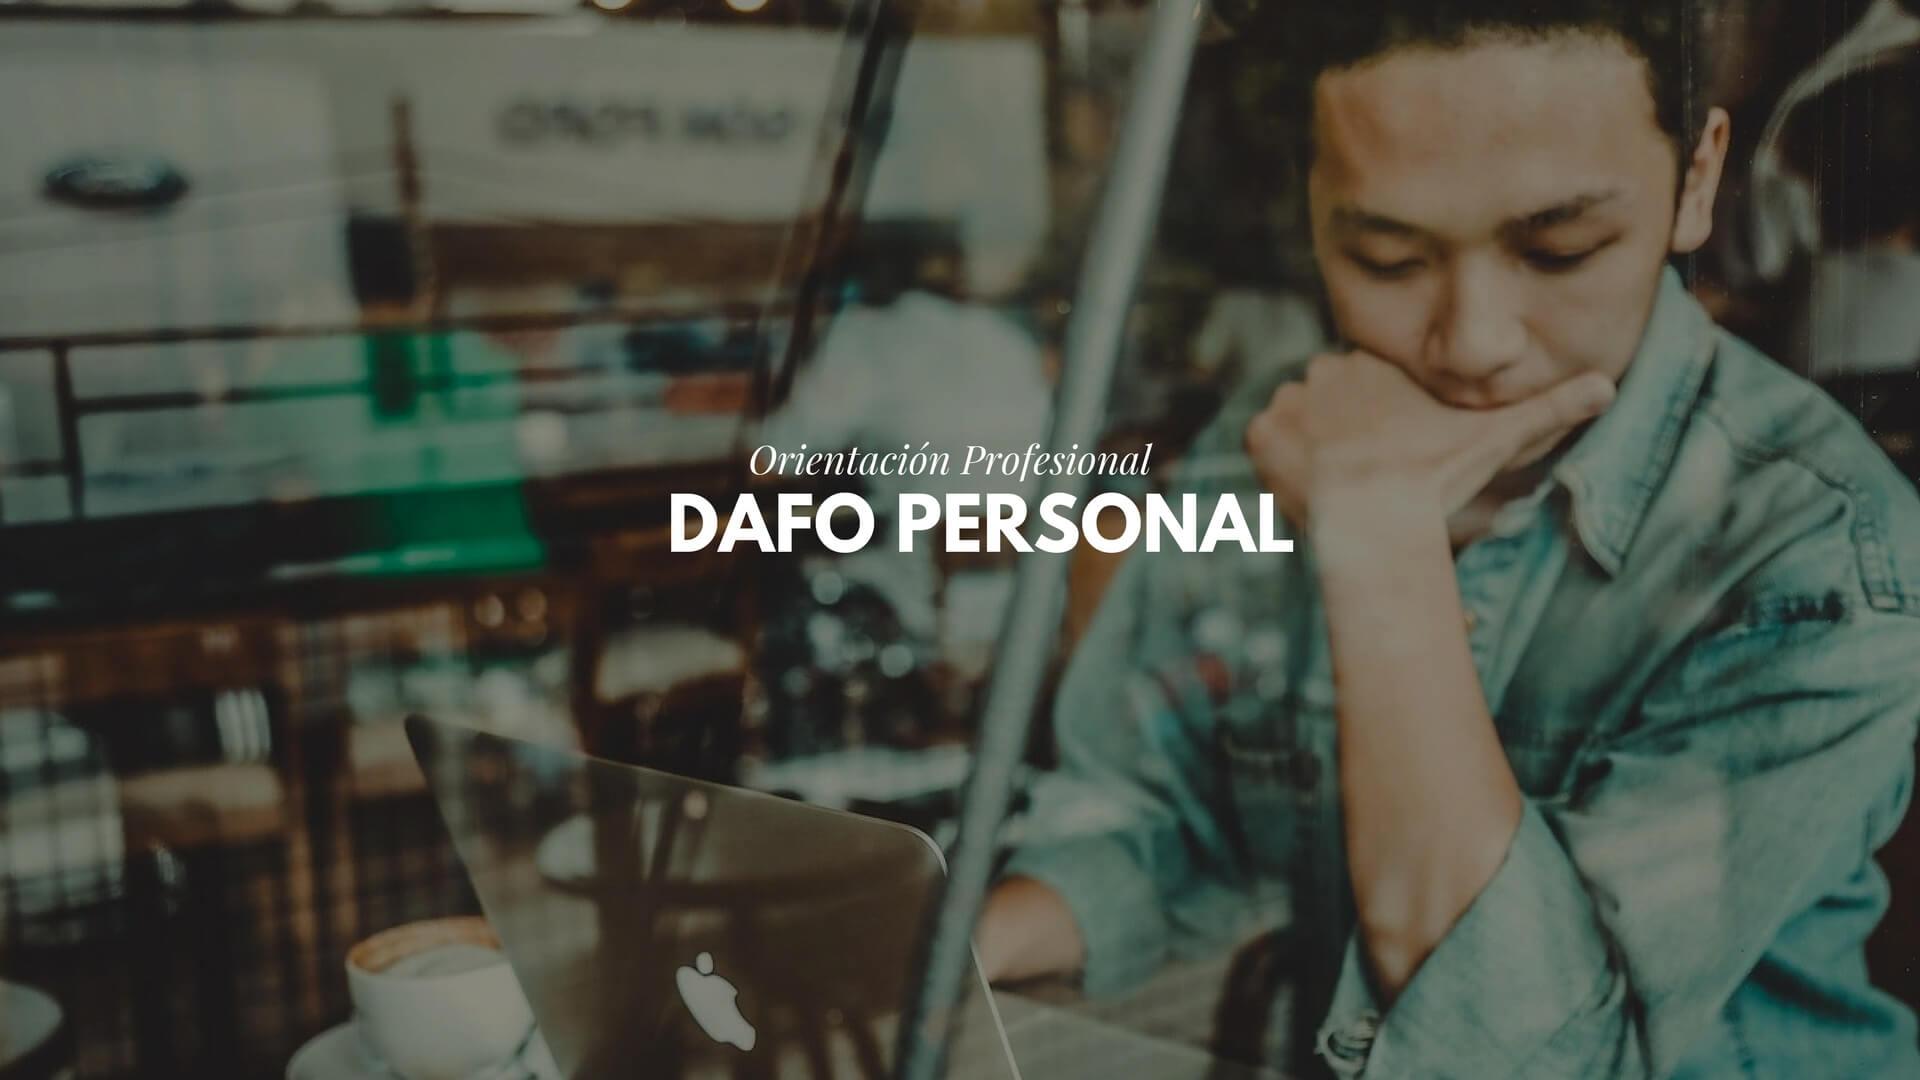 DAFO personal profesional